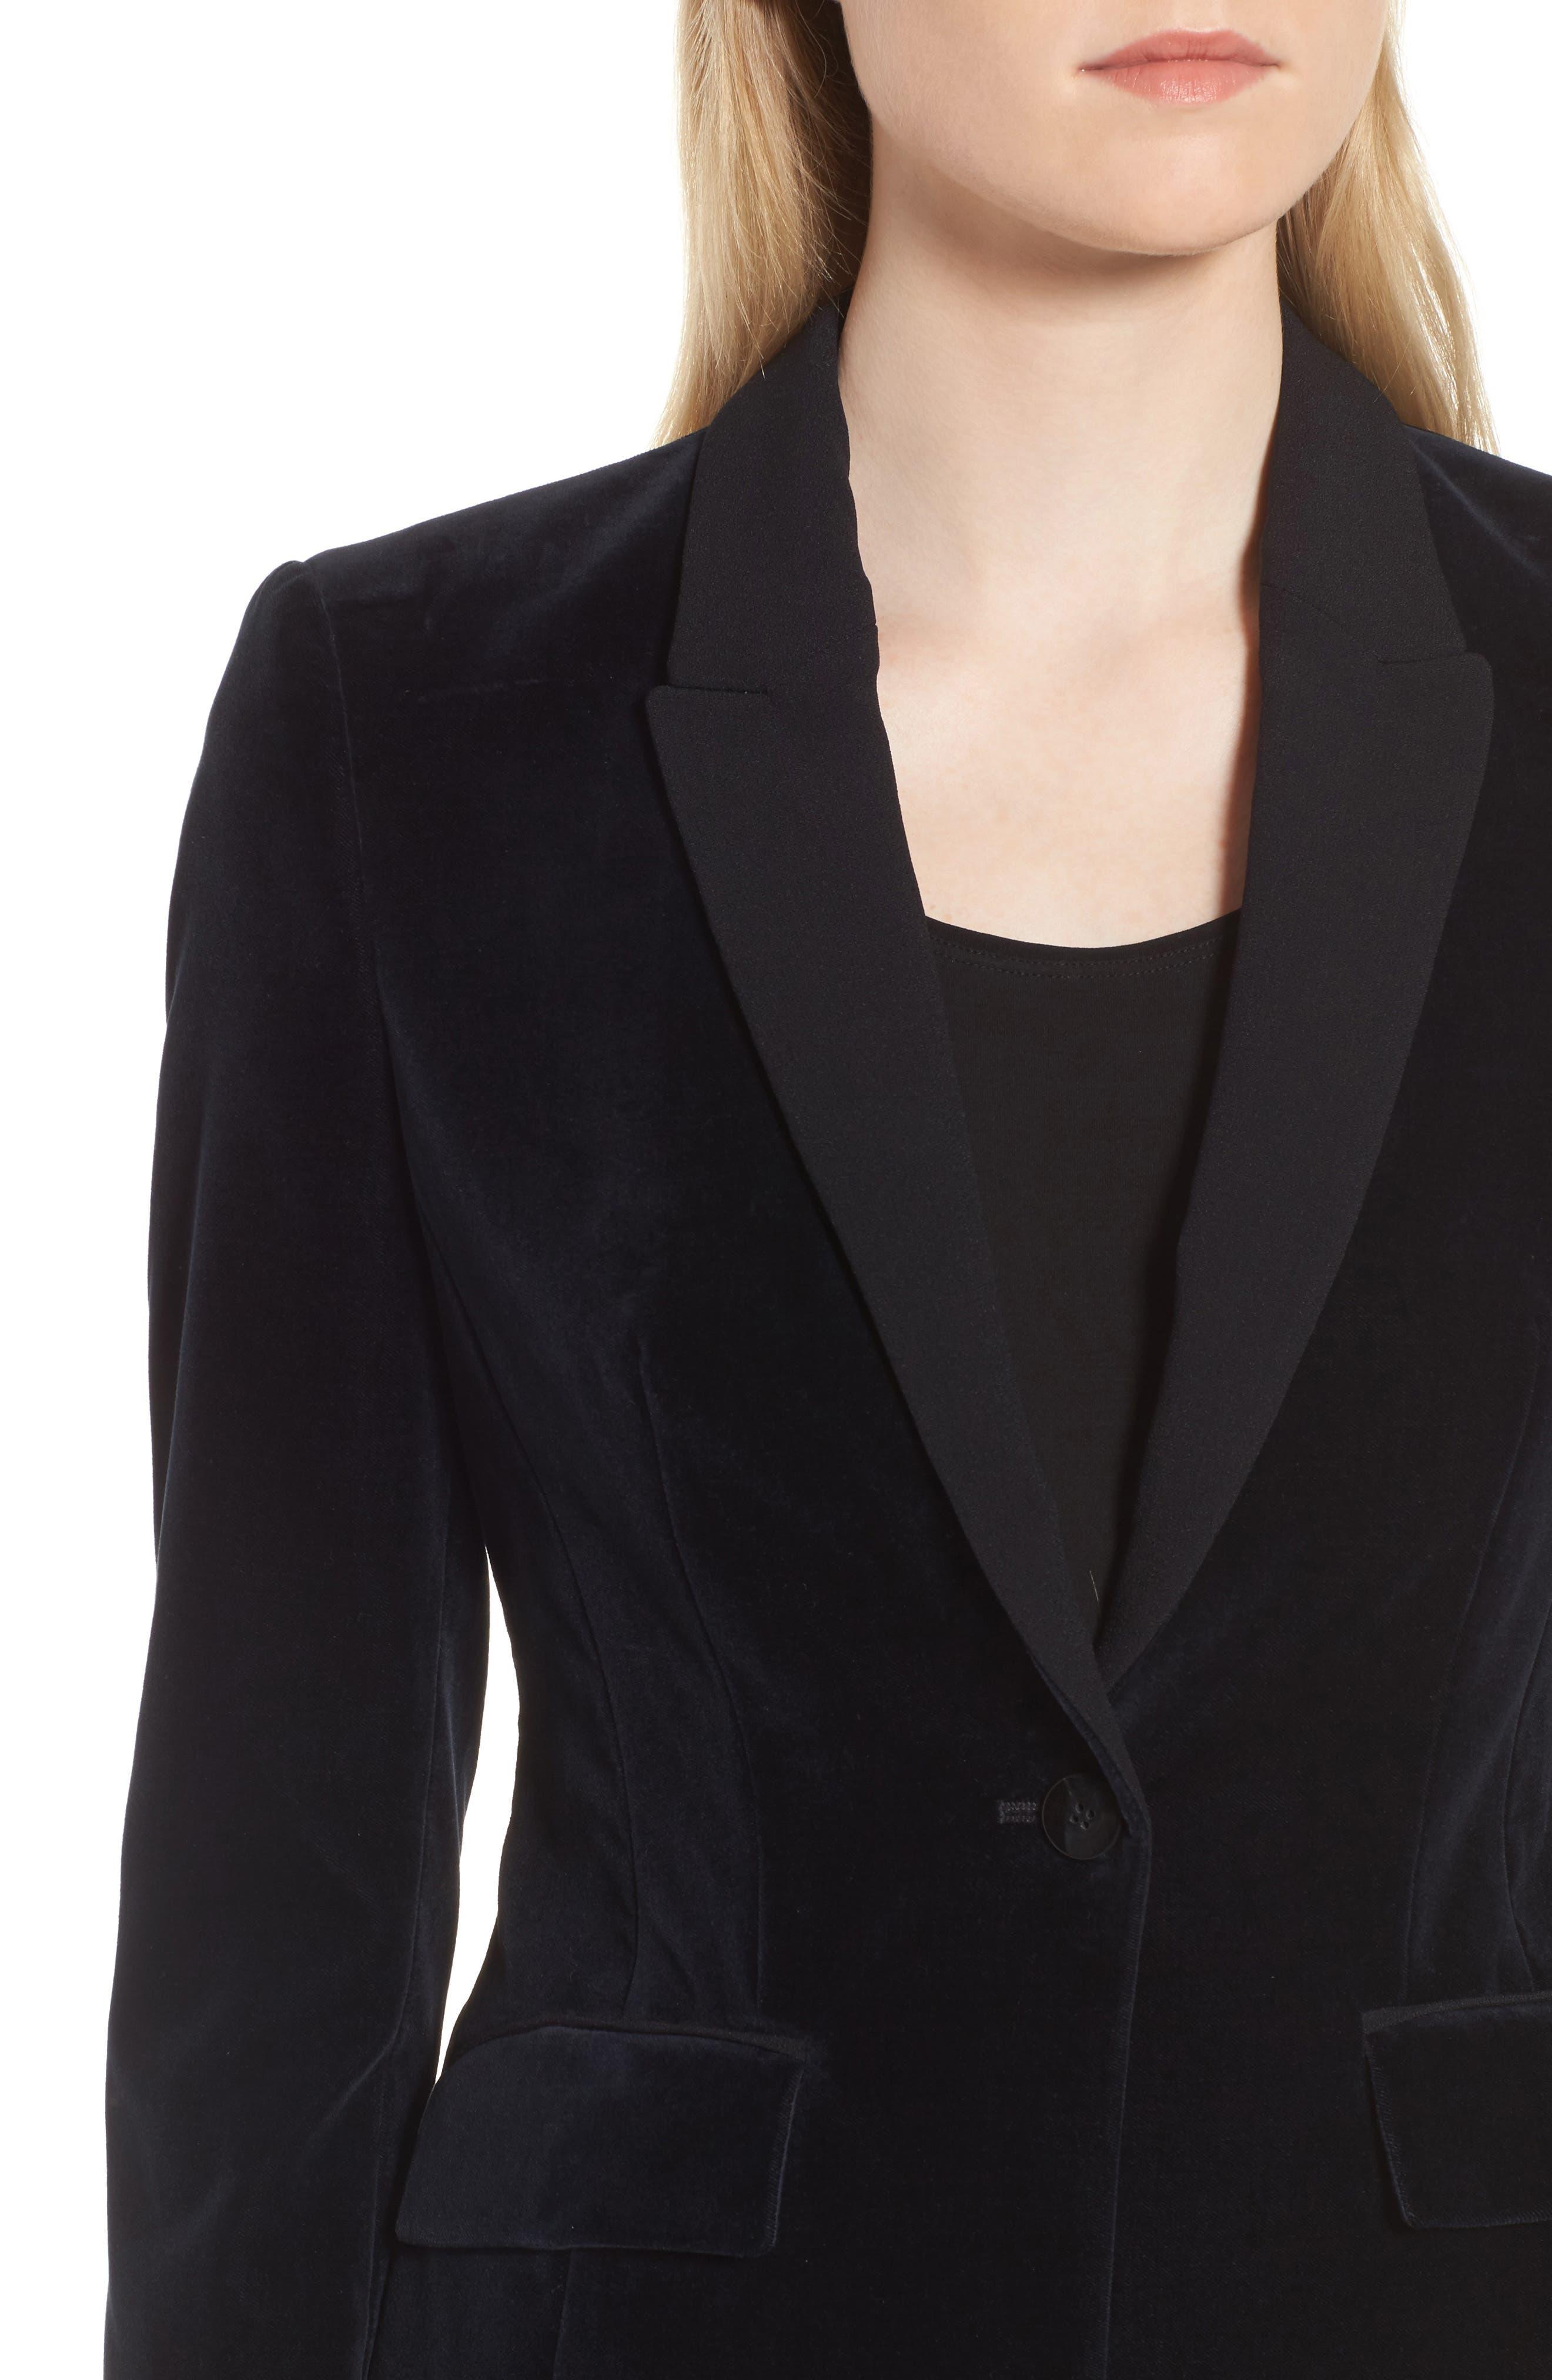 Jeronala Velvet Tuxedo Jacket,                             Alternate thumbnail 4, color,                             480